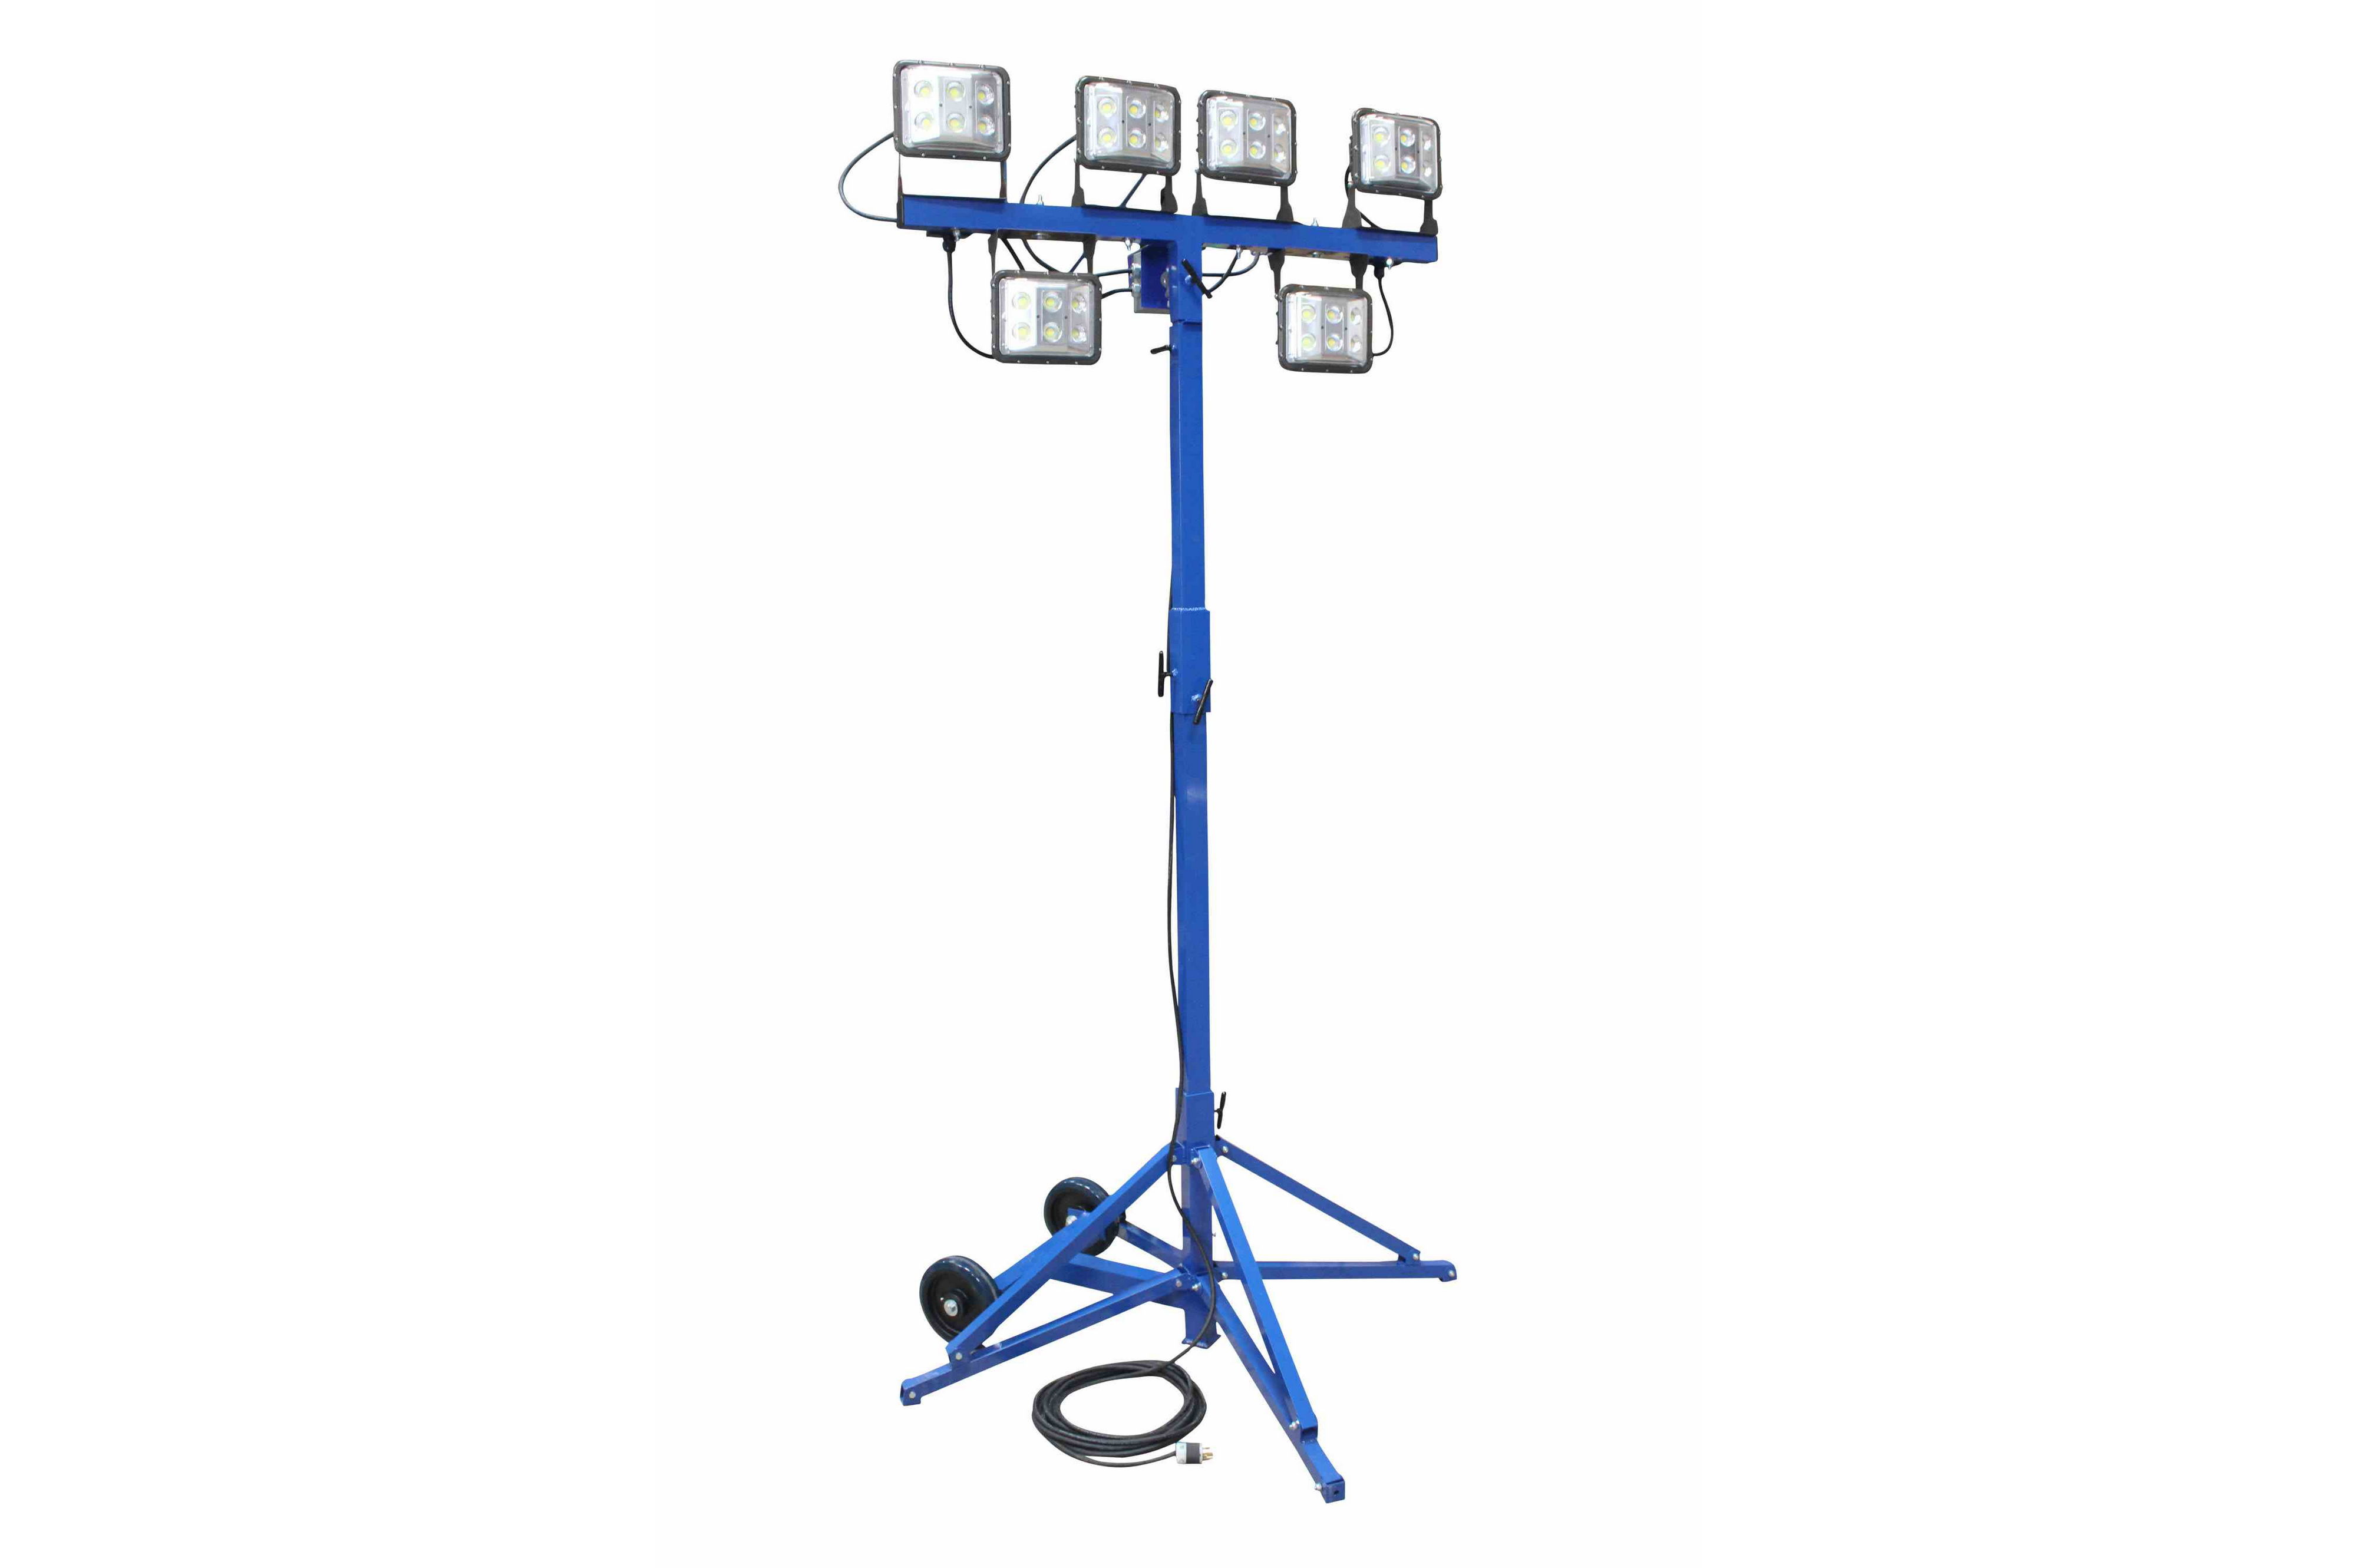 360 Watt Led Work Area Quadpod Light Fixture